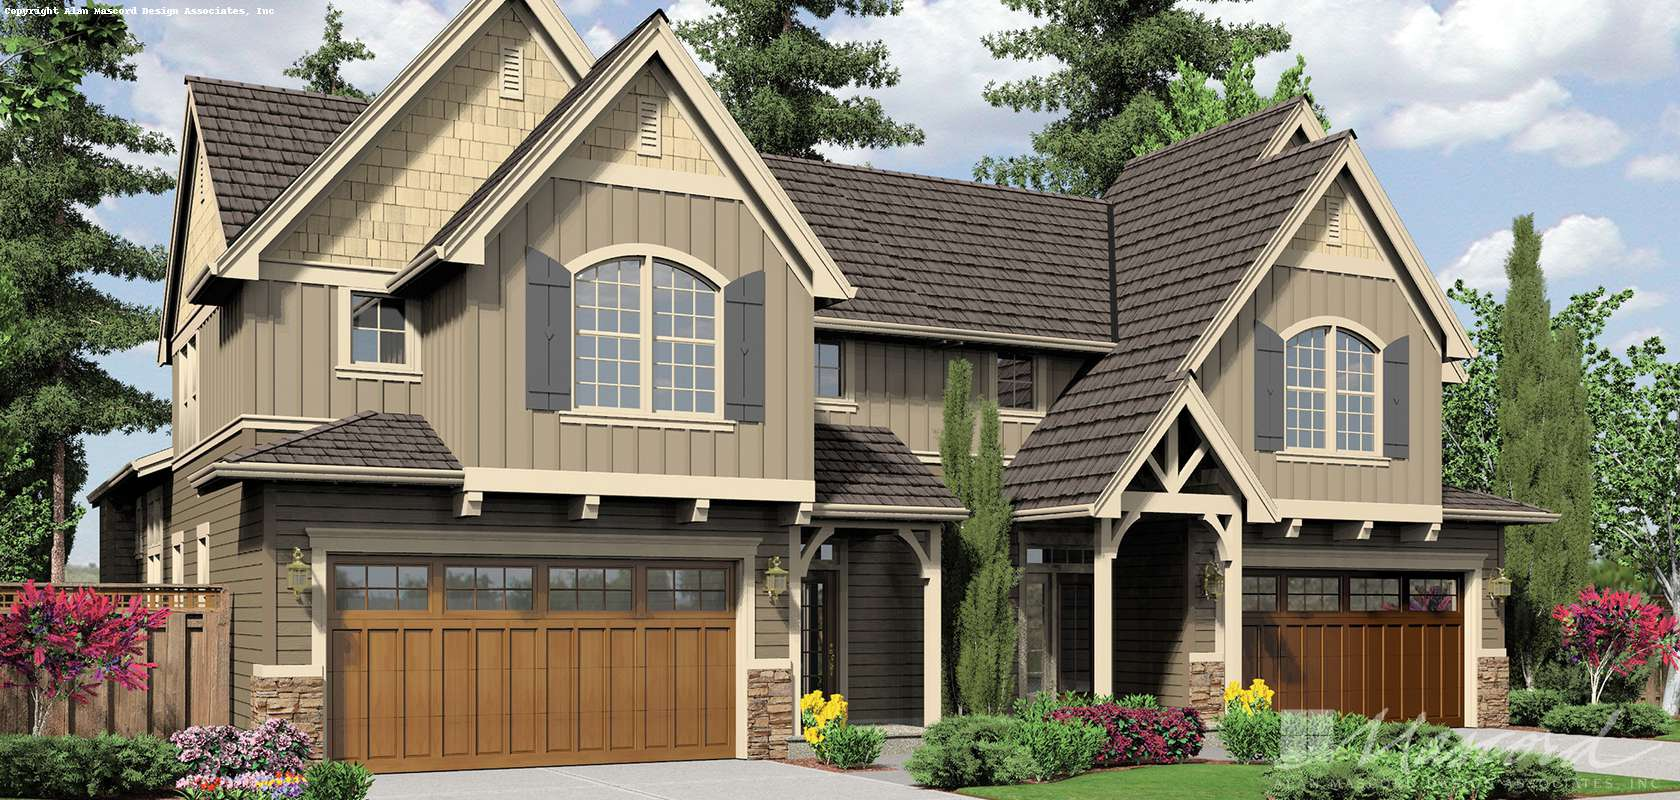 Mascord House Plan 4037: The Whitman